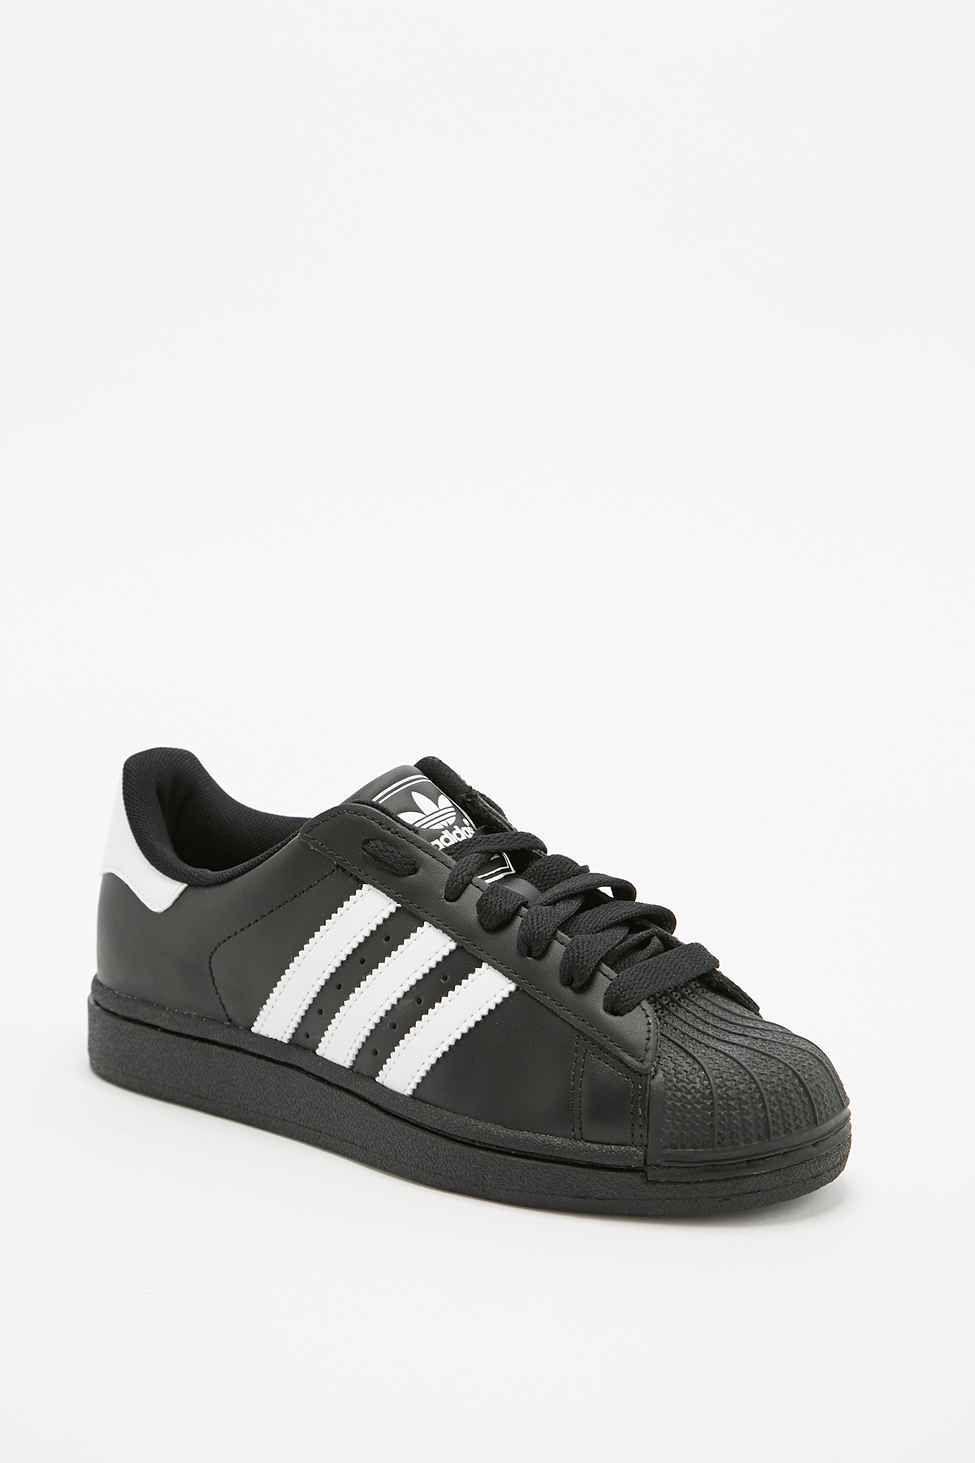 0bb6991257e0 Adidas Originals Superstar 2 White Stripe Trainers in Black ...